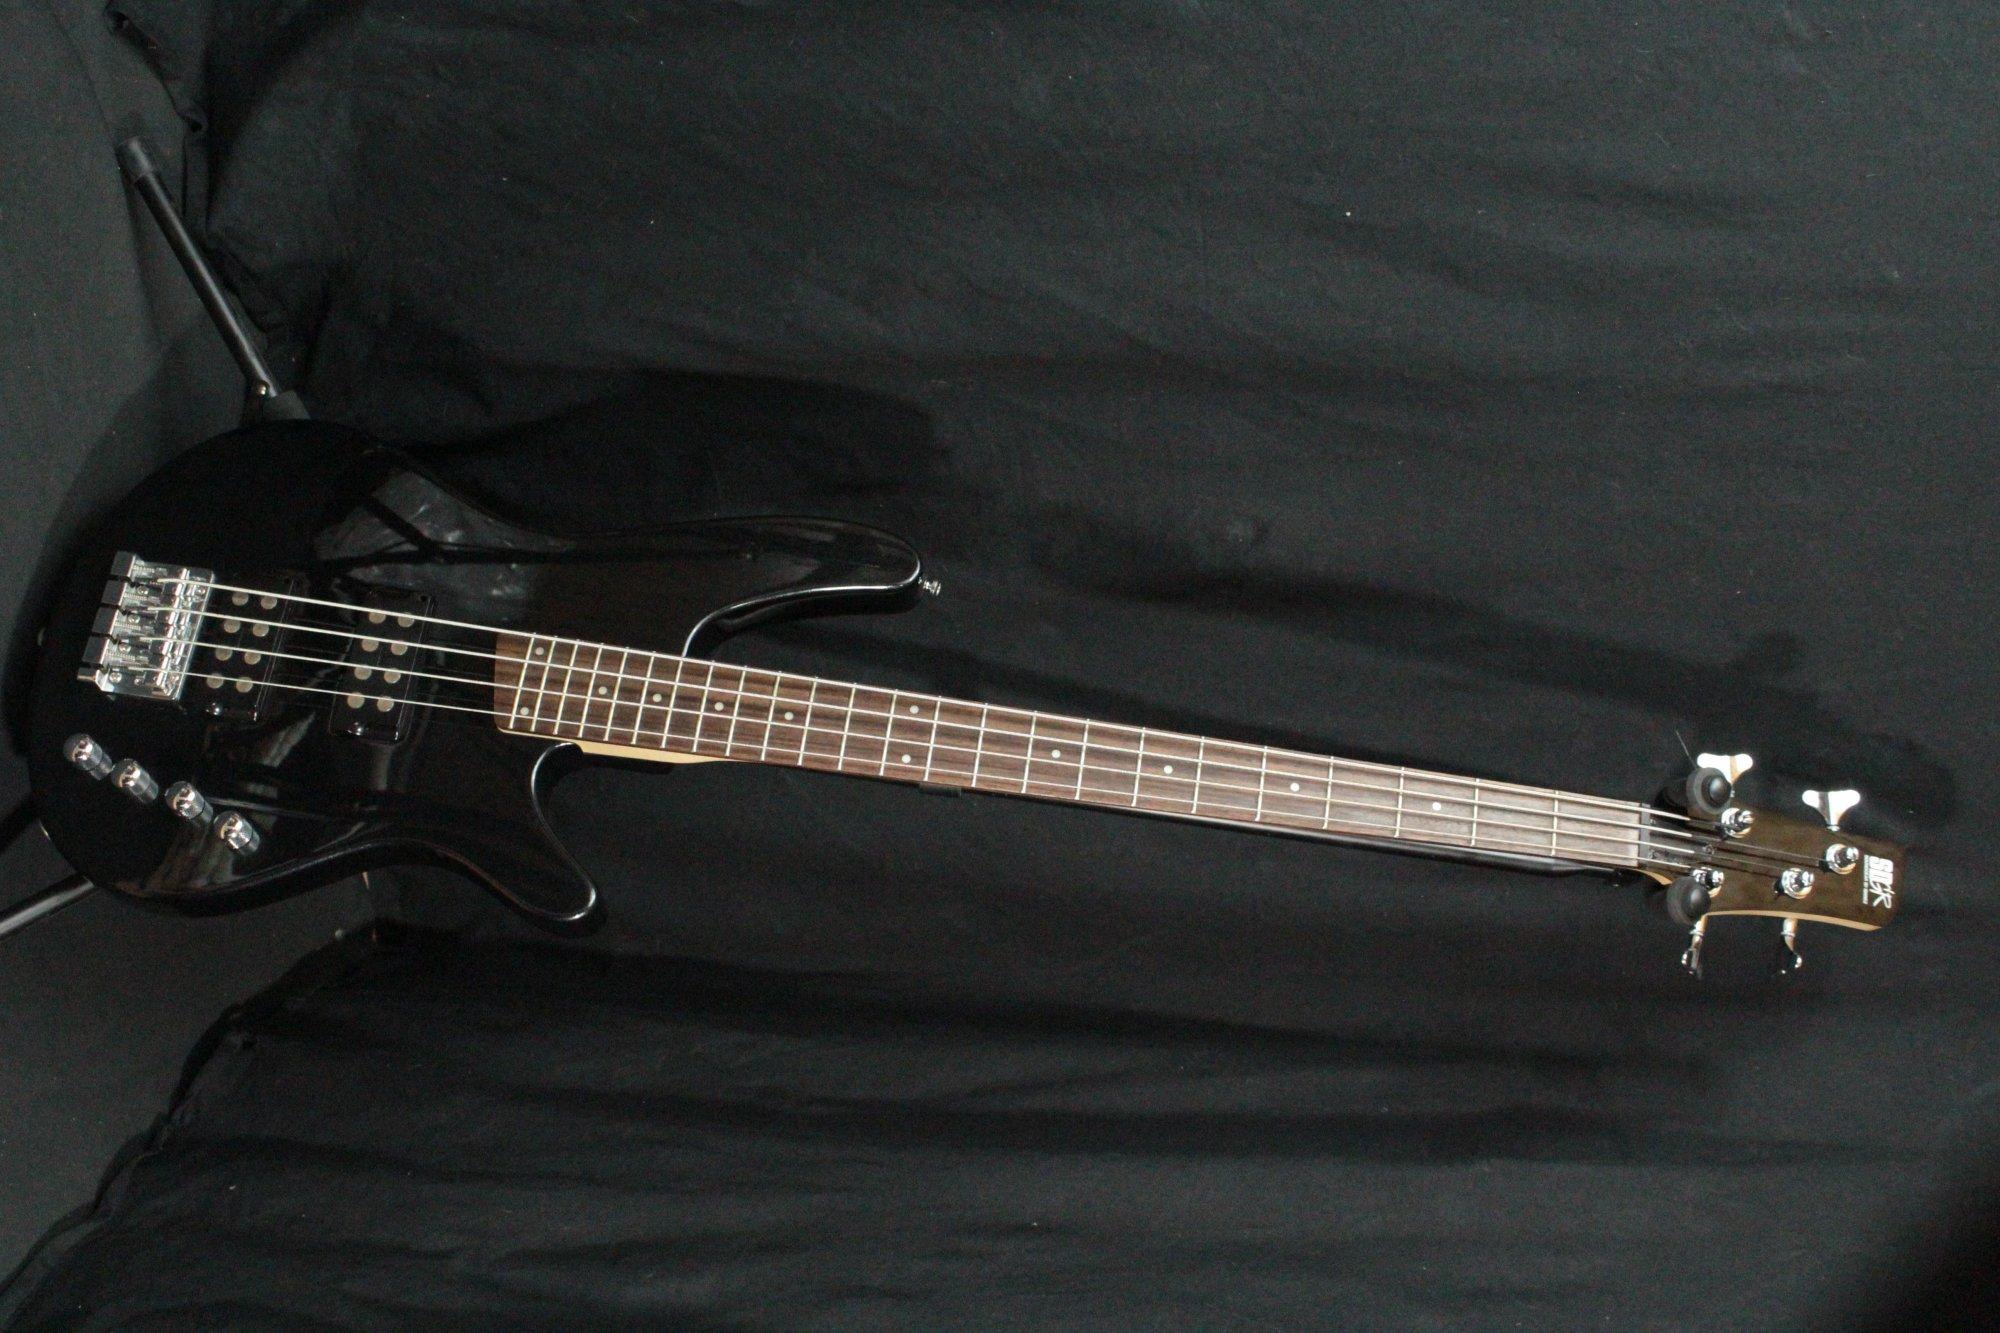 USED Ibanez SDGR SHX300 Black Bass